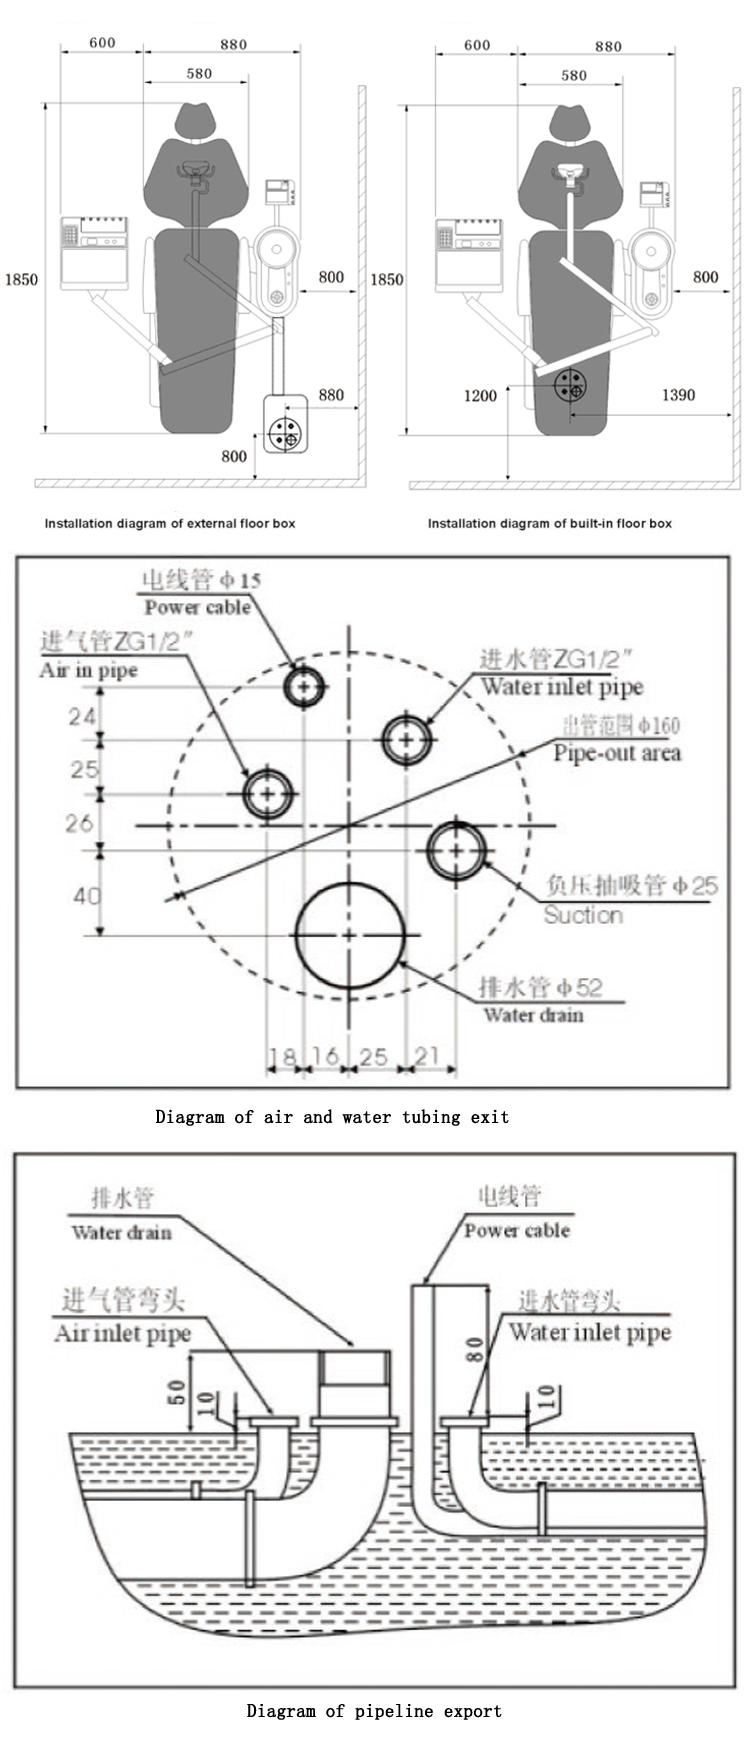 TR-R2_Installation_Diagram